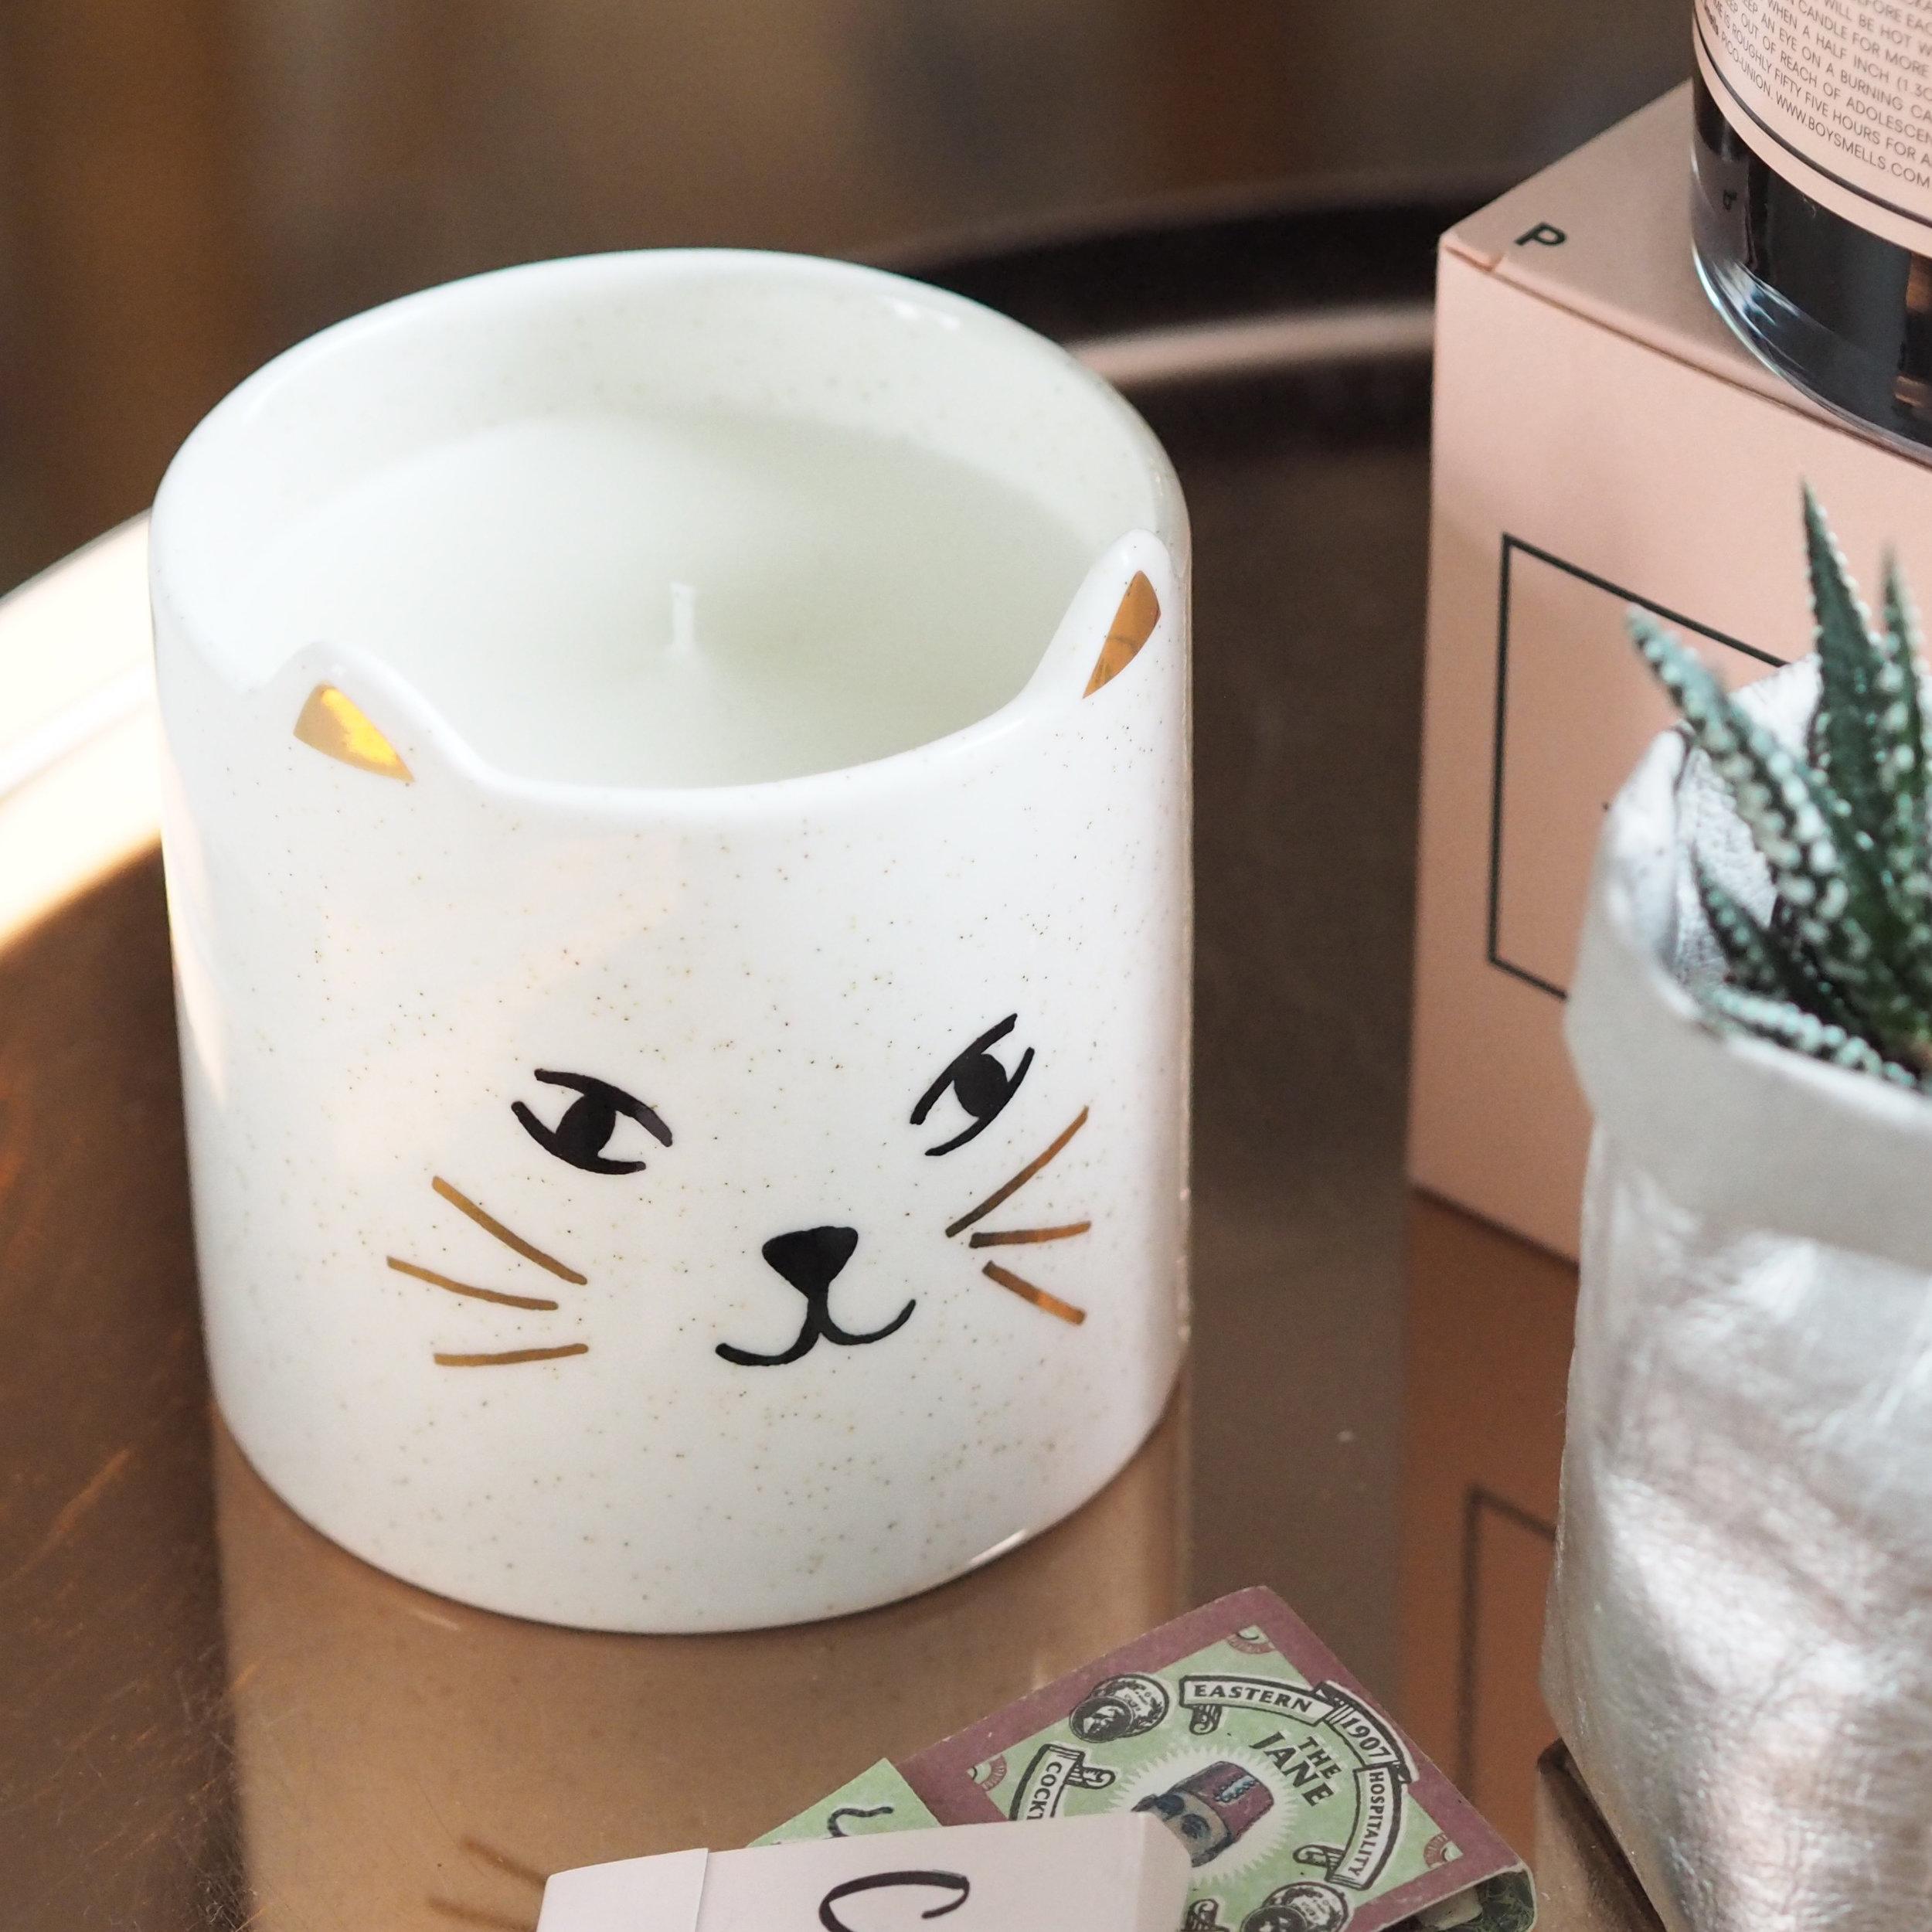 Oliver Bonas Cat Candle.jpg